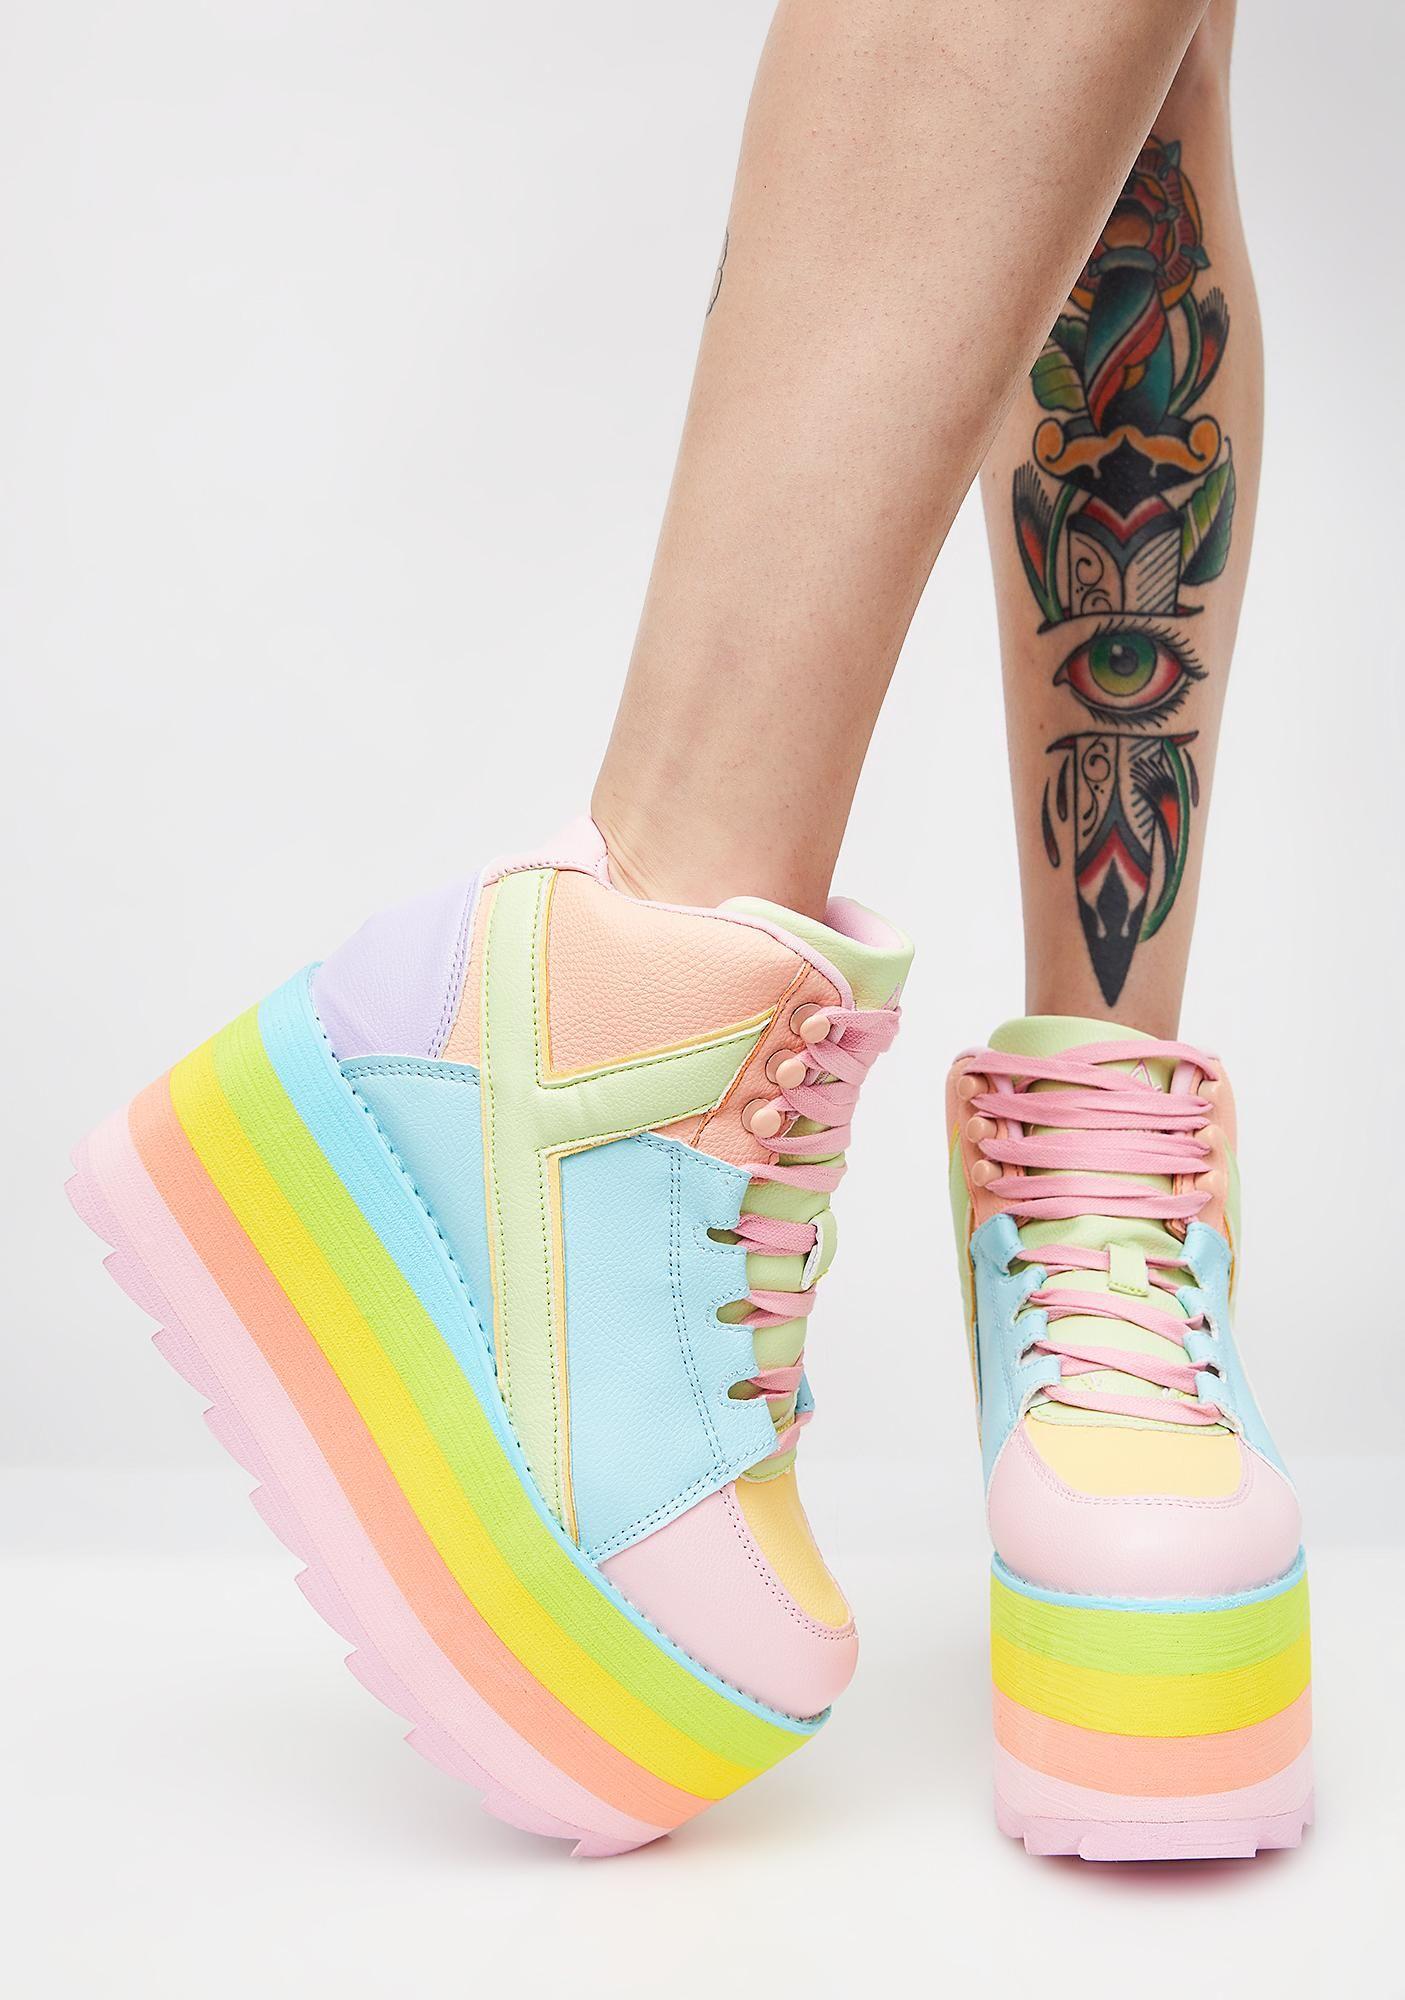 Pre)Skoolin' U Platform Qozmo Sneakers